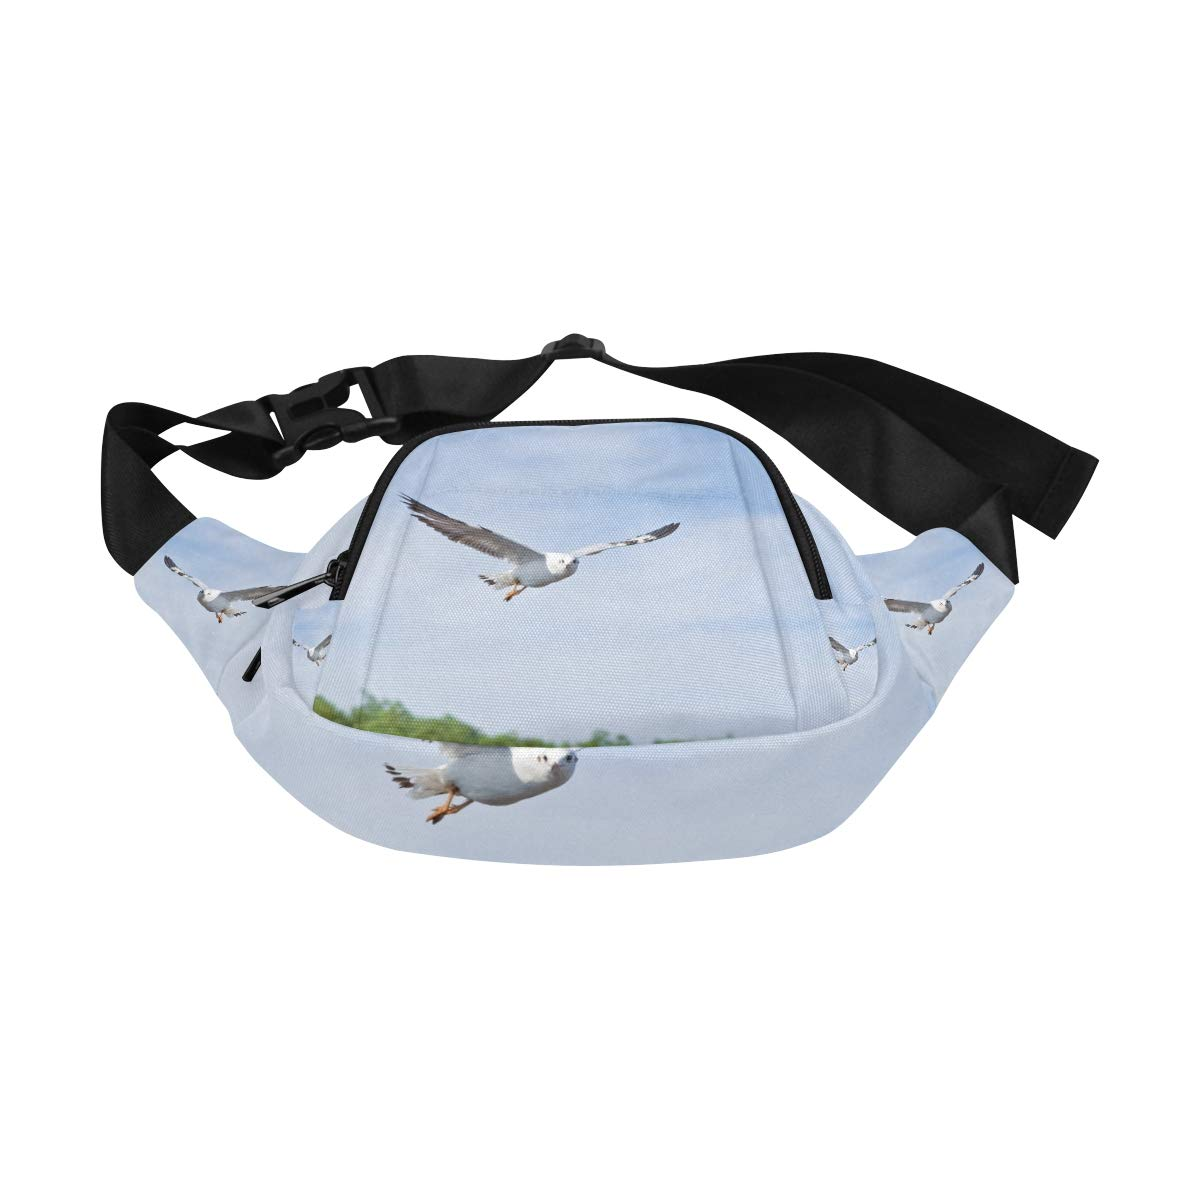 Common Gull Flying Above River Fenny Packs Waist Bags Adjustable Belt Waterproof Nylon Travel Running Sport Vacation Party For Men Women Boys Girls Kids